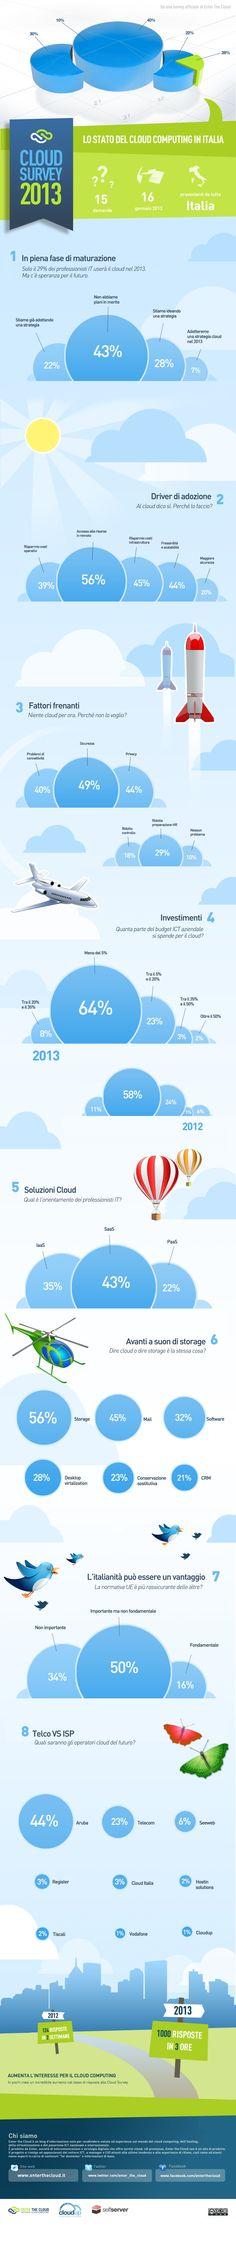 "In infographic tutti i dati emersi dall'indagine:""Cloud Computing in Italia – 2013"":"